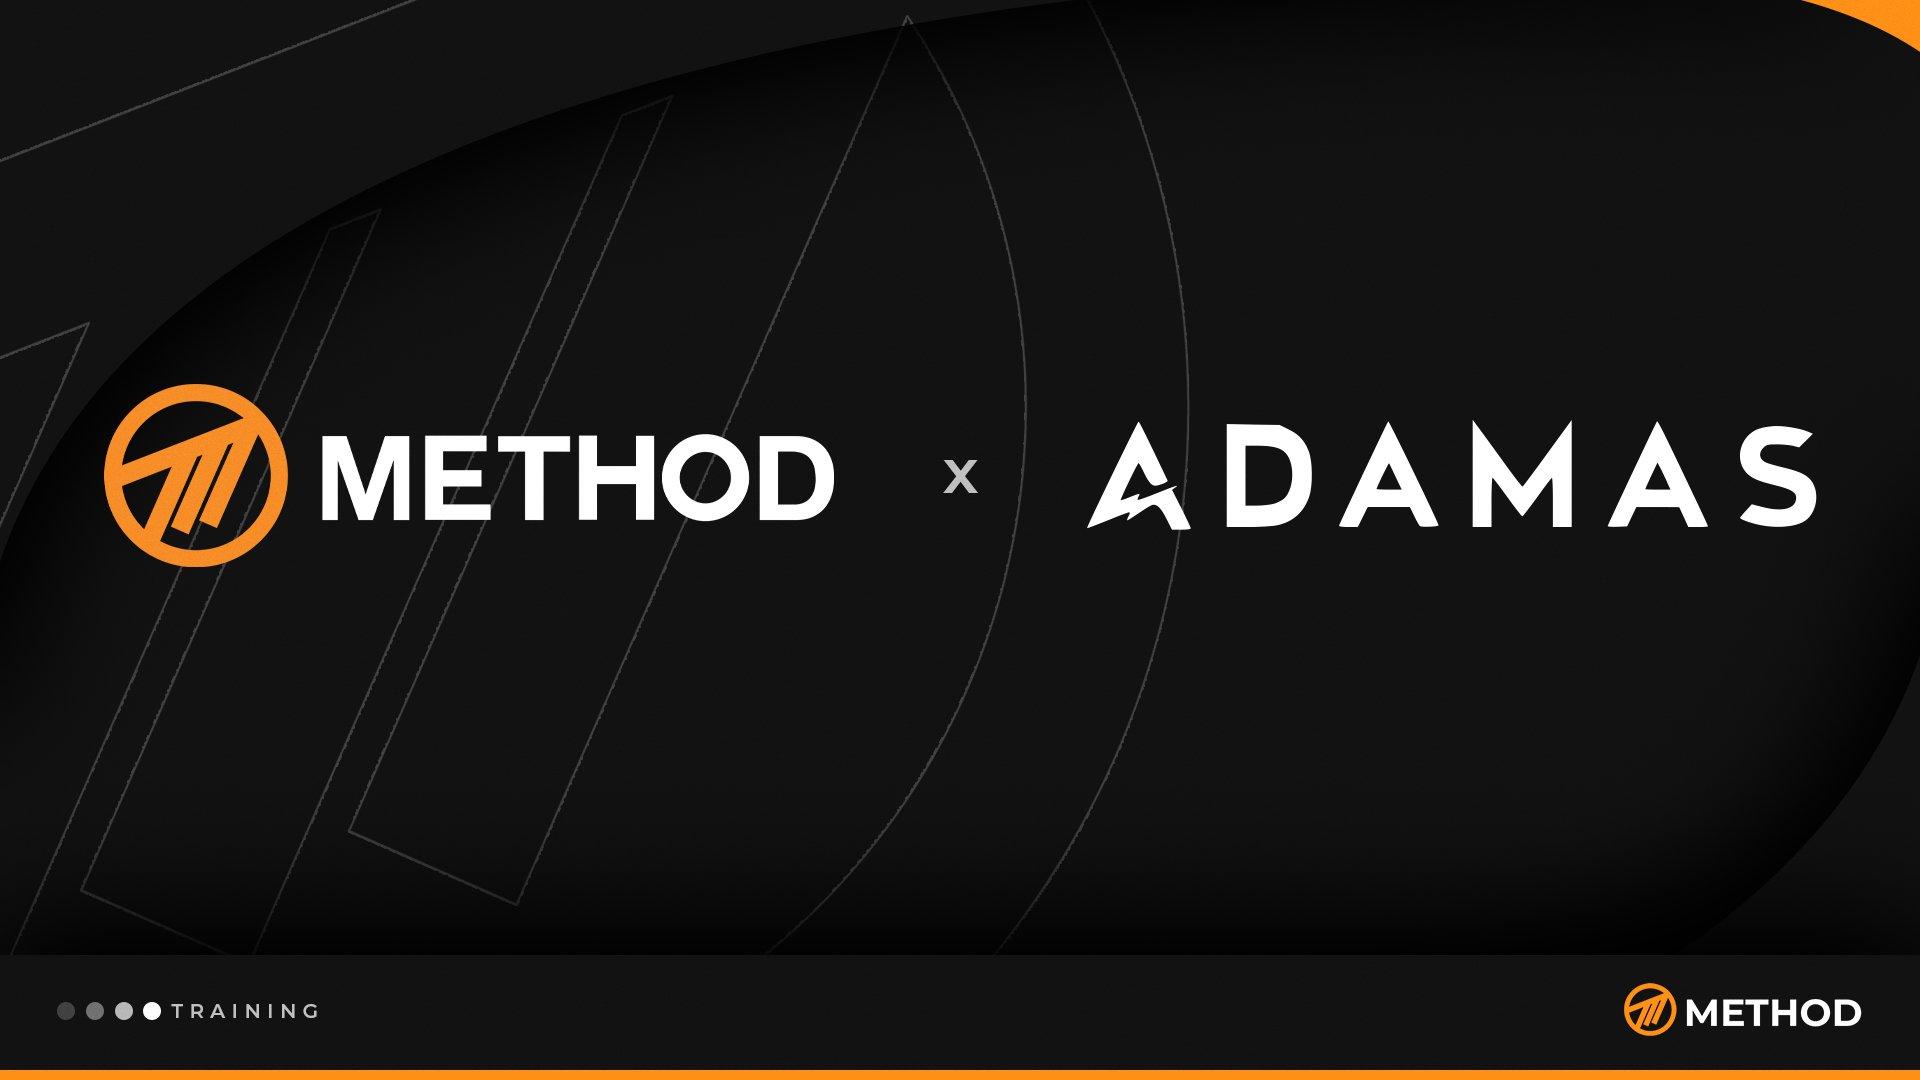 Method strengthens performance with Adamas Esports partnership – Esports Insider